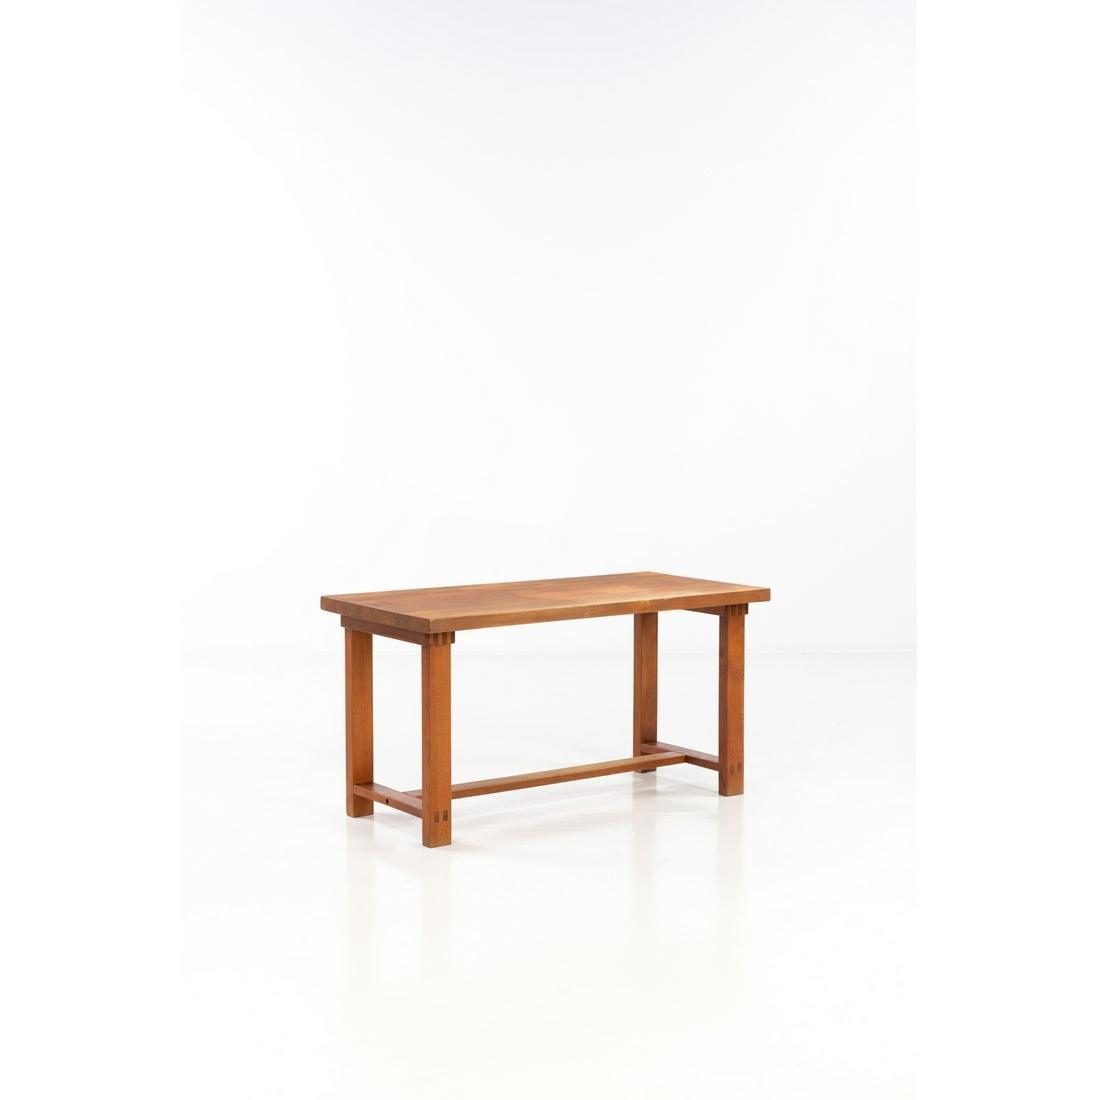 Pierre Chapo (1927-1987) Model no. T01 Table Elm wood